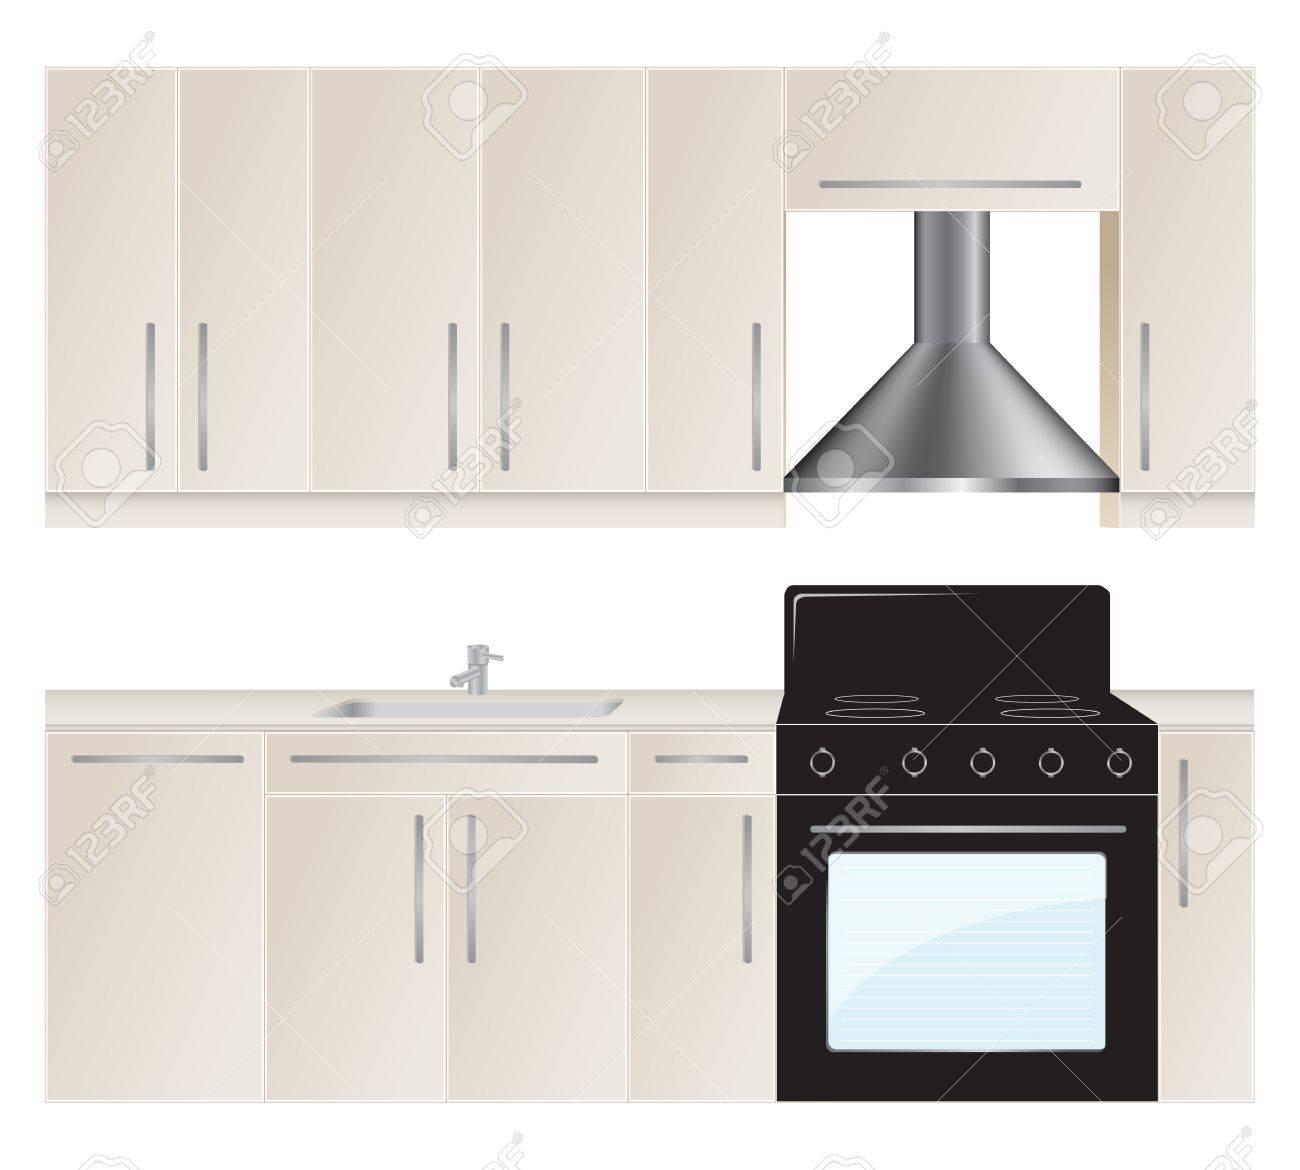 Kitchen furniture set. Vector illustration. Stock Vector - 12136975